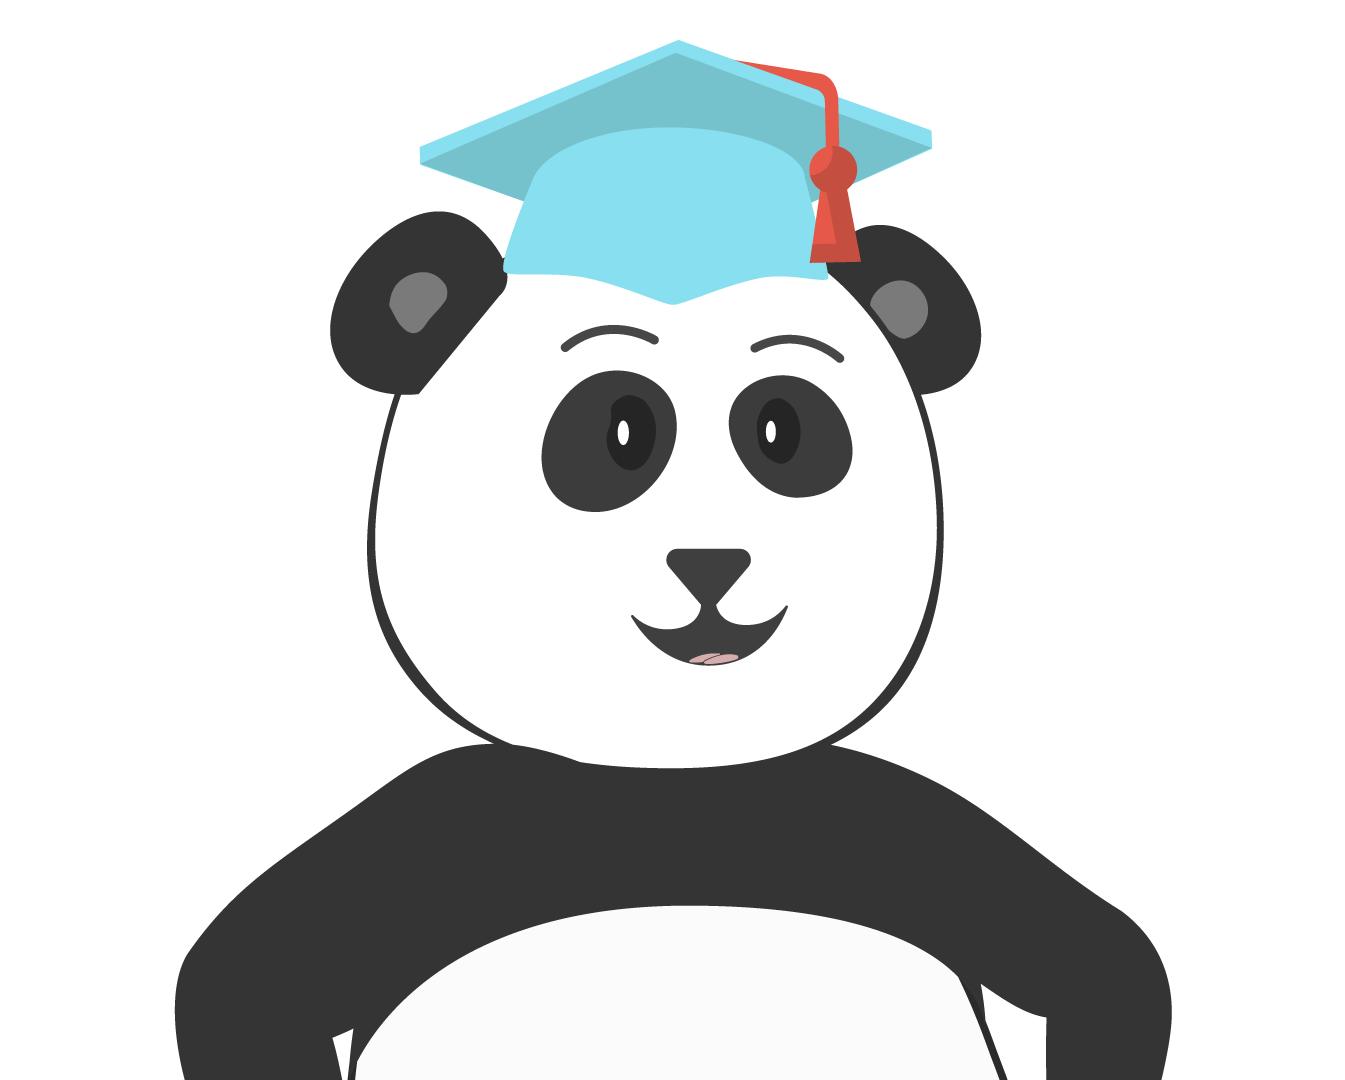 Pete the Panda Waving